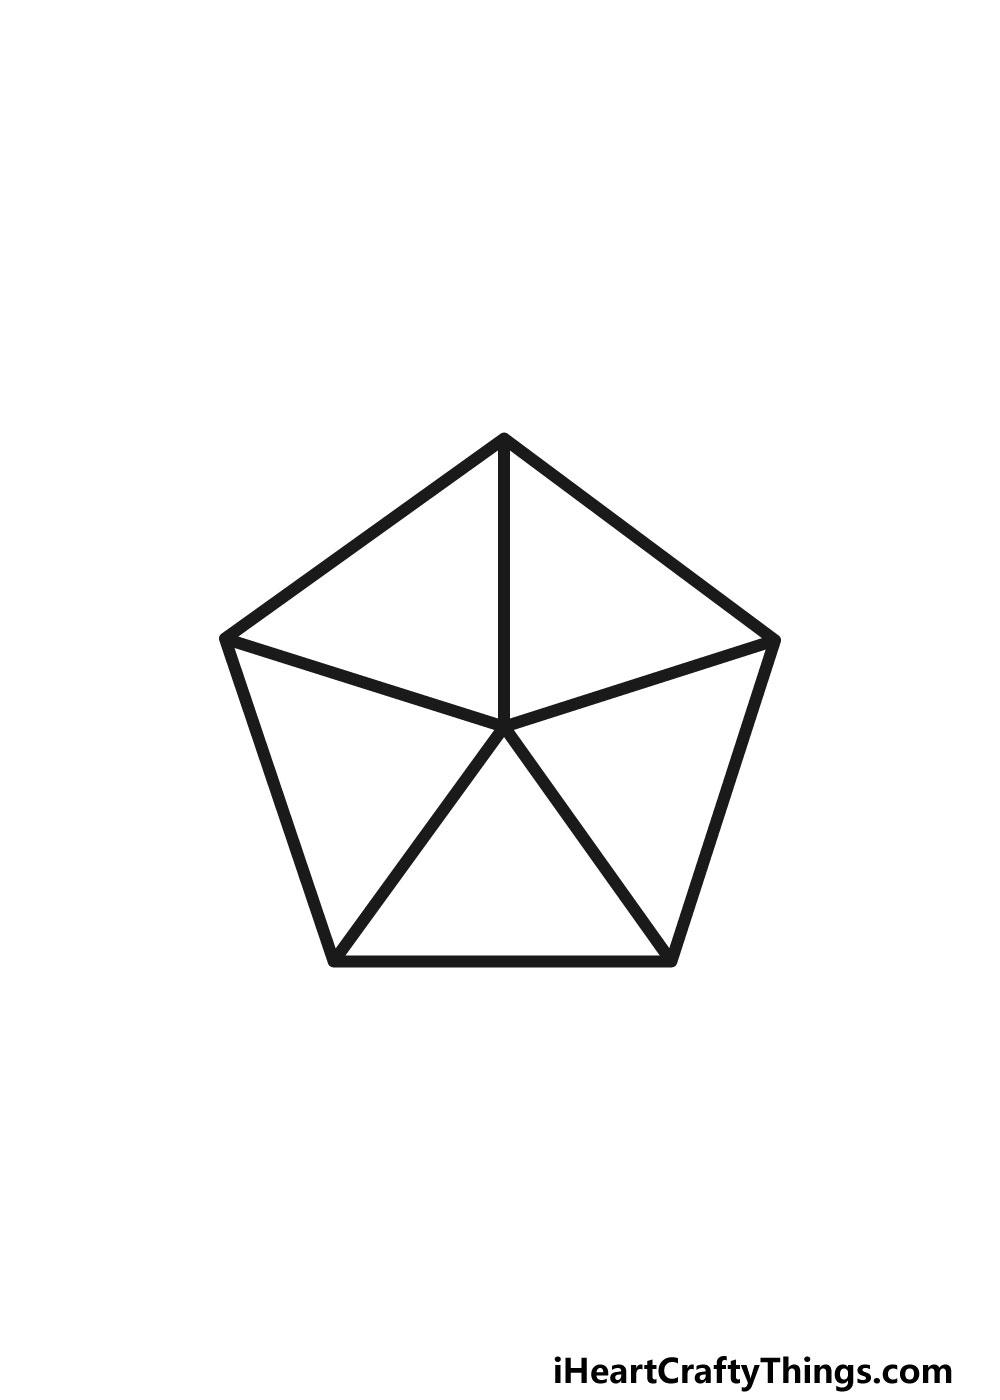 drawing a pentagon step 5